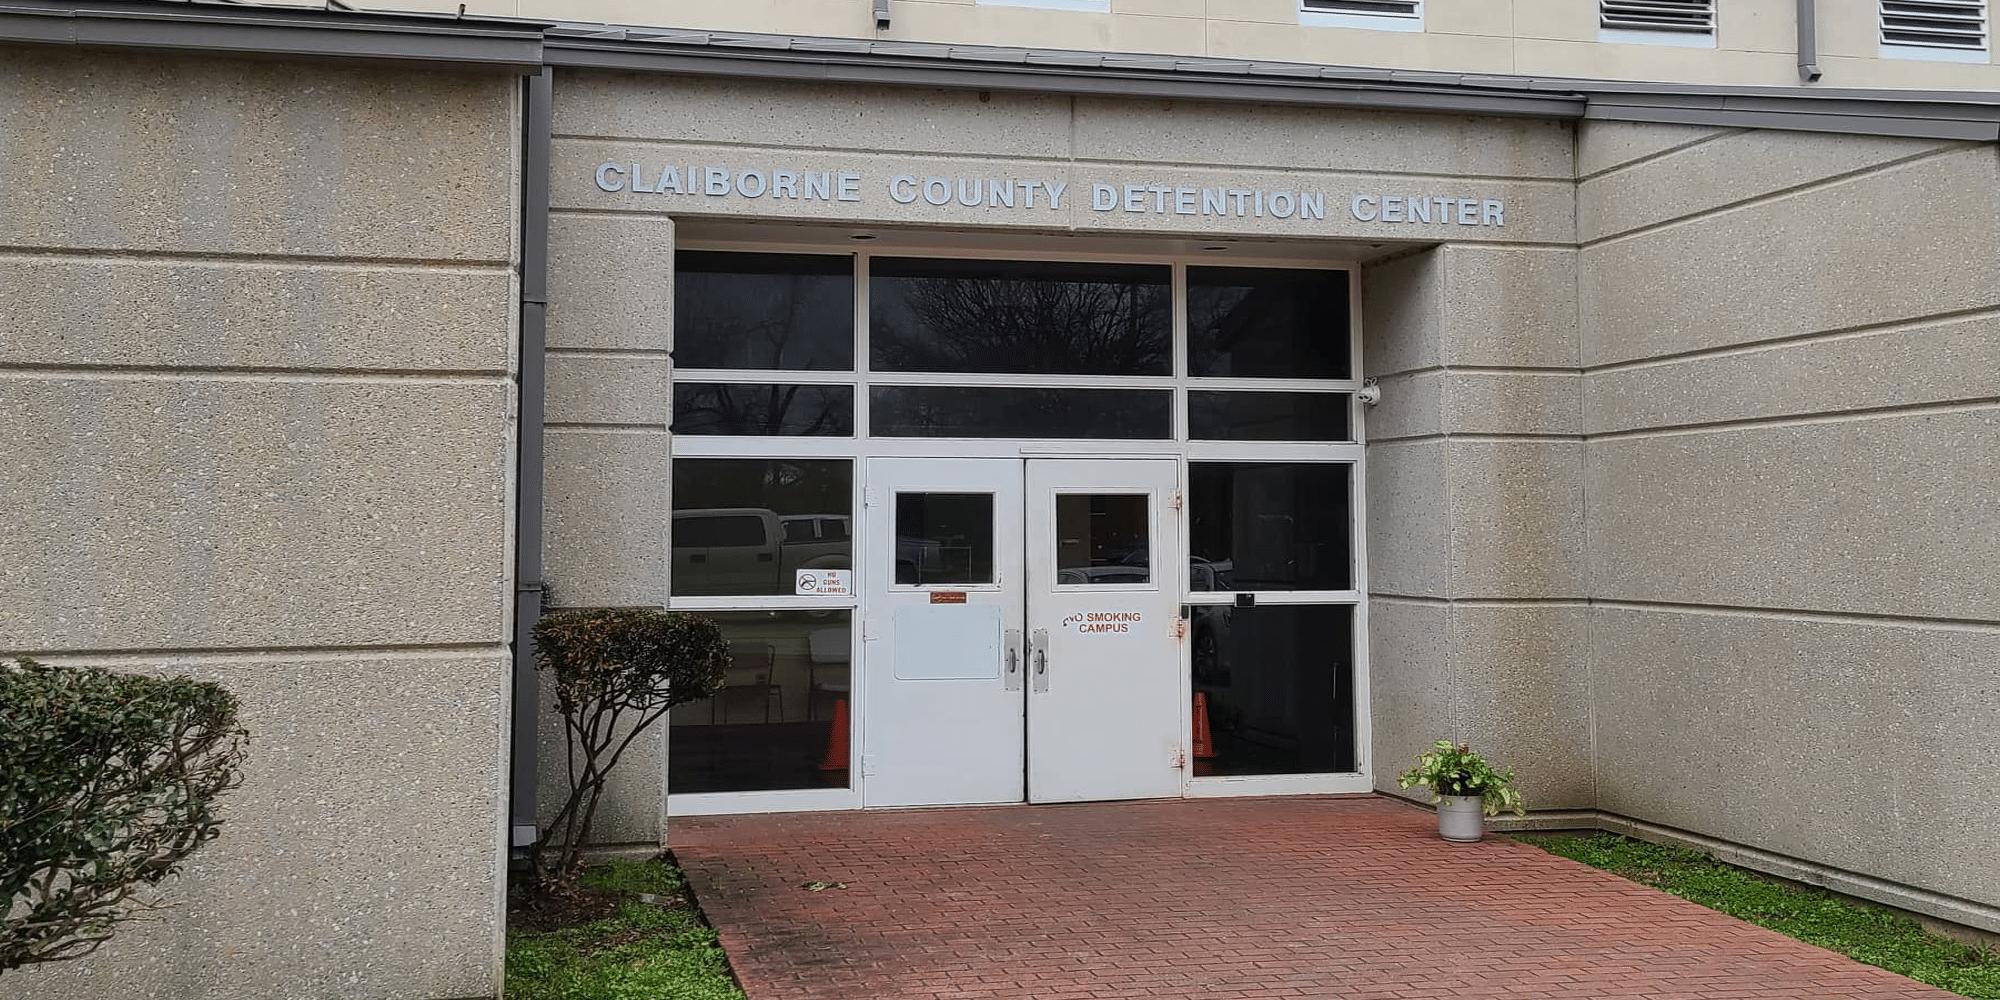 Claiborne County Detention Center